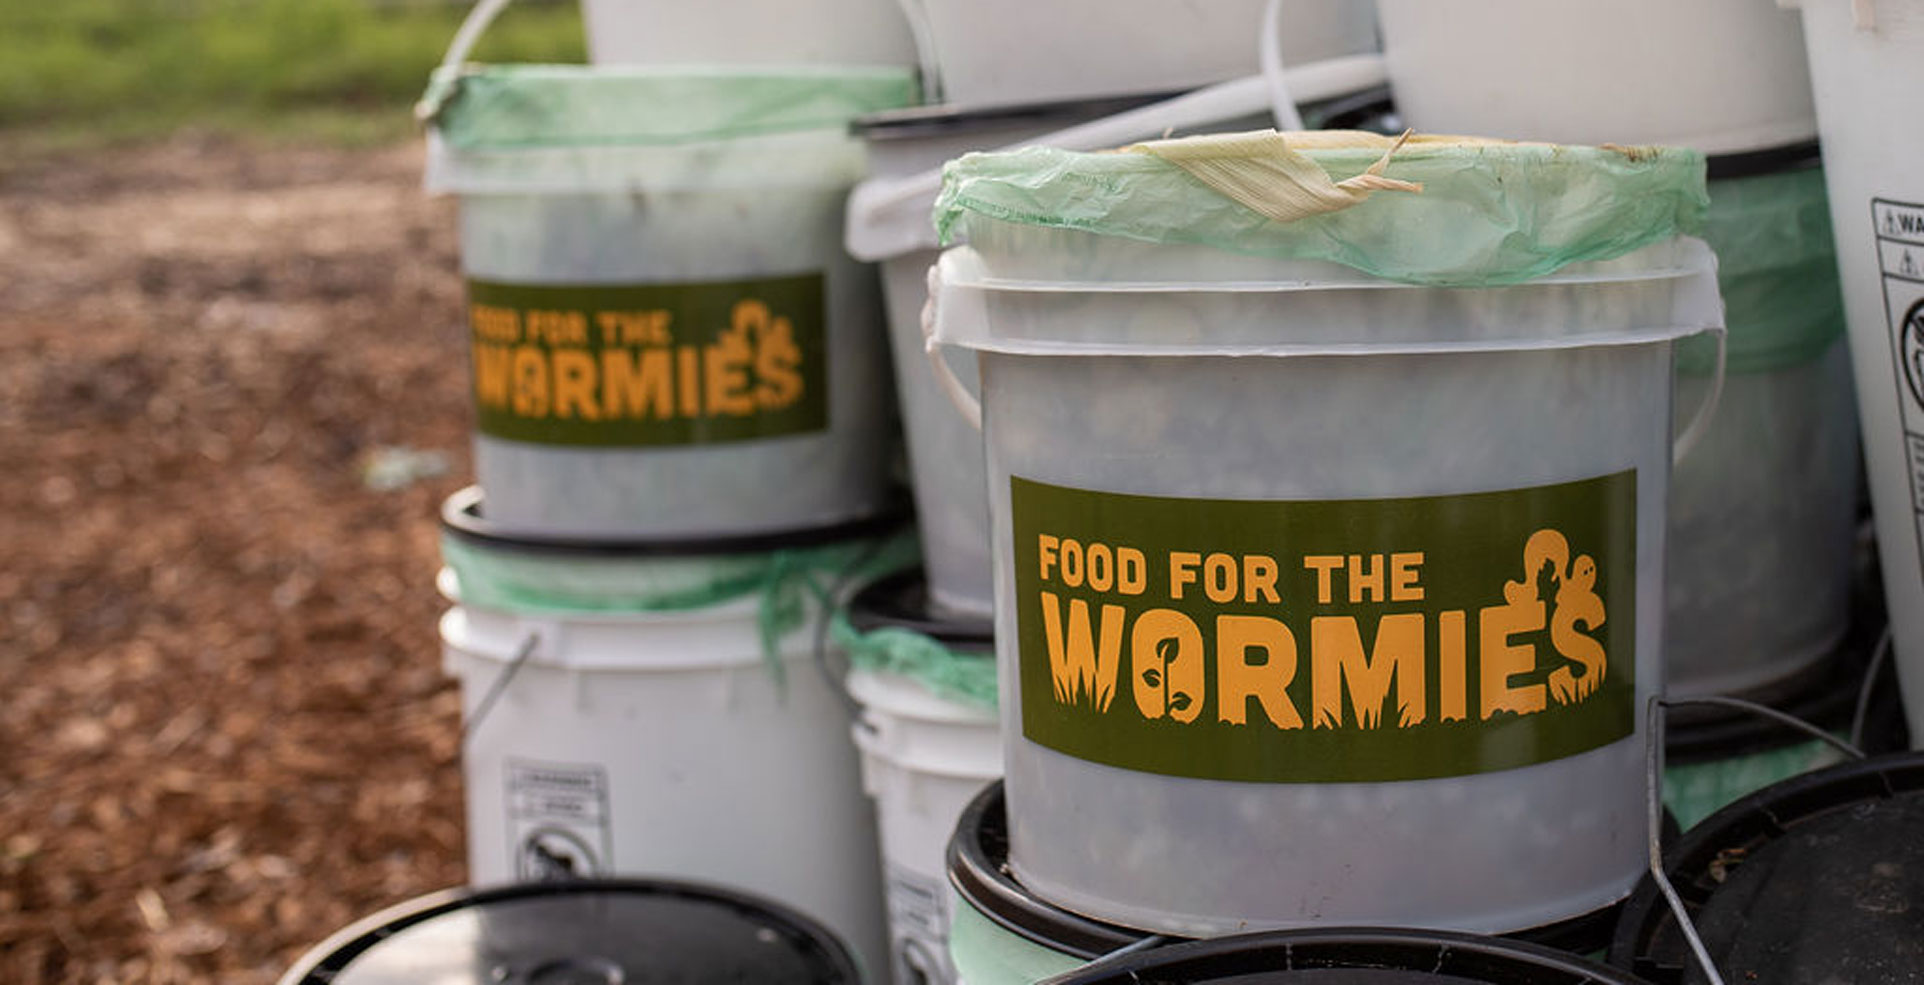 Food Scrap Pick Up Service Composting in Grand Rapids